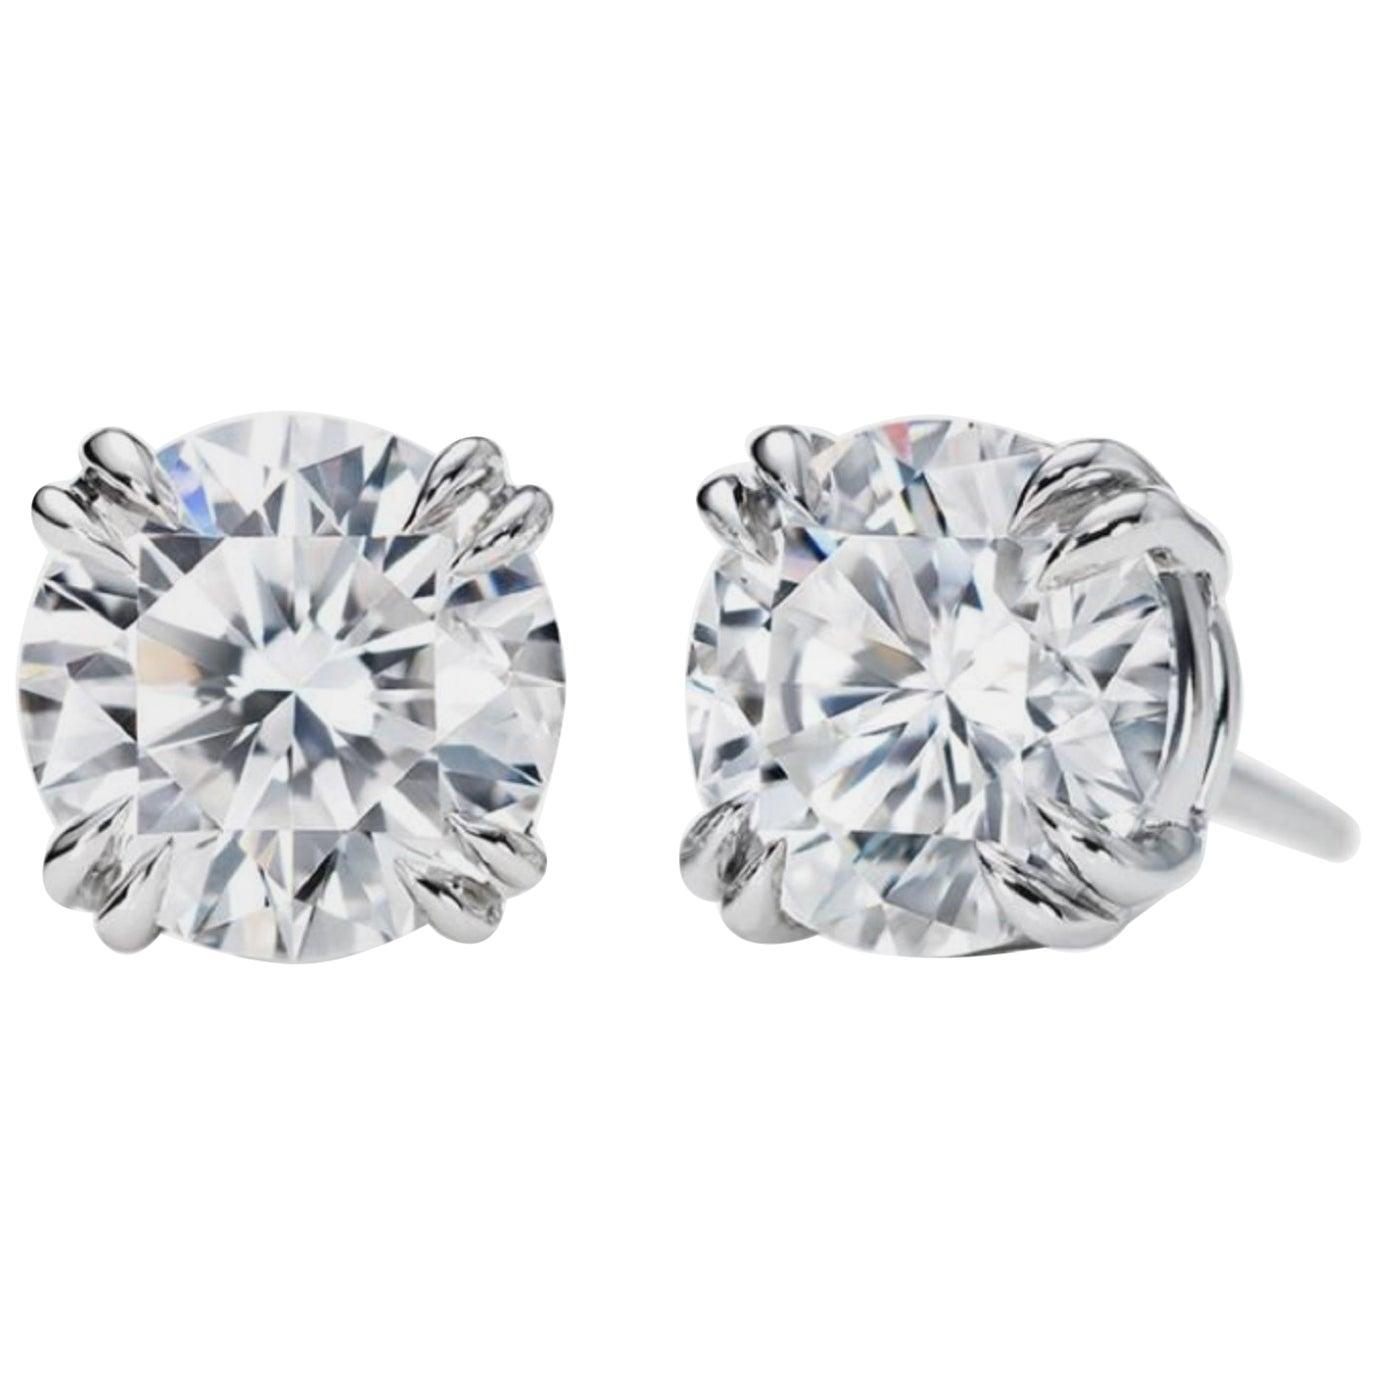 GIA 3.06 Carats Diamond Studs E Color VVS1 Clarity